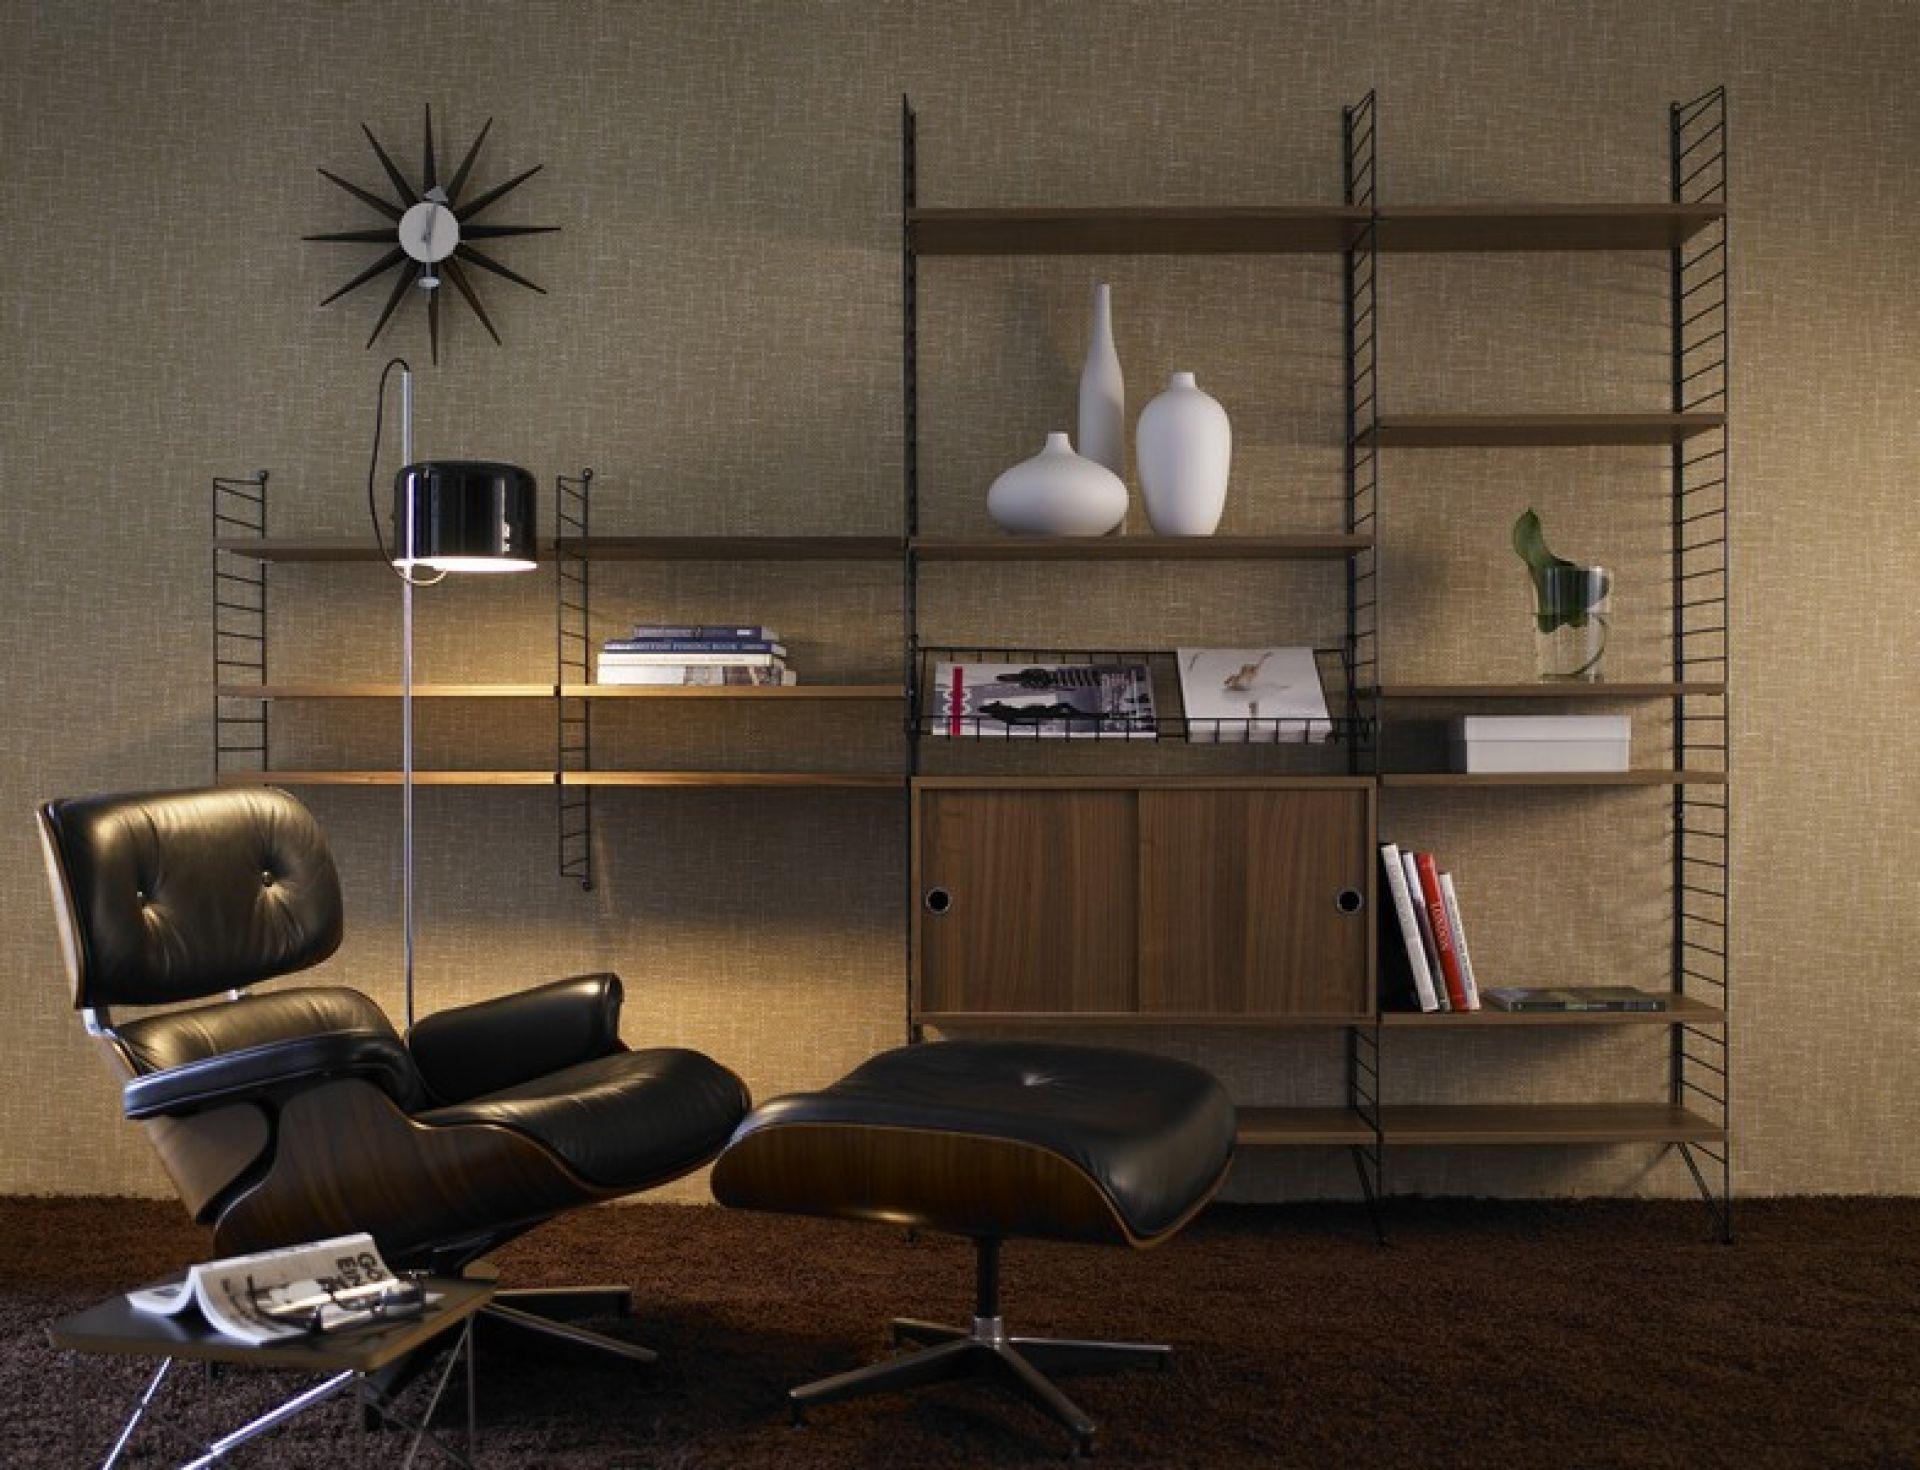 Additional Side wall 2-er Set for String wall depth 20 cm String Furniture